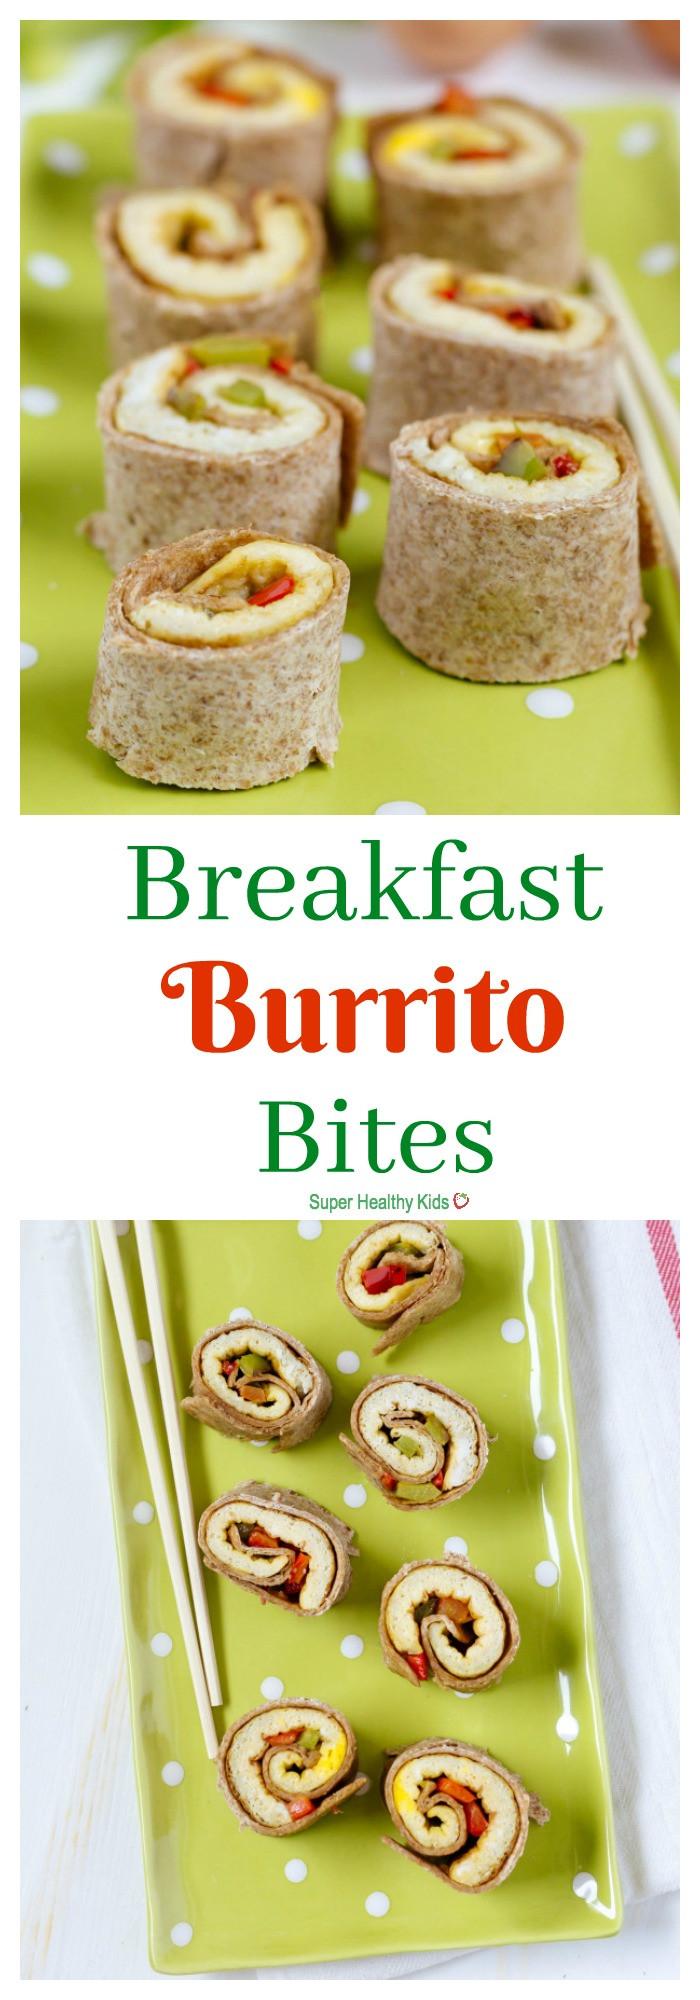 Healthy Breakfast Bites  Breakfast Burrito Bites